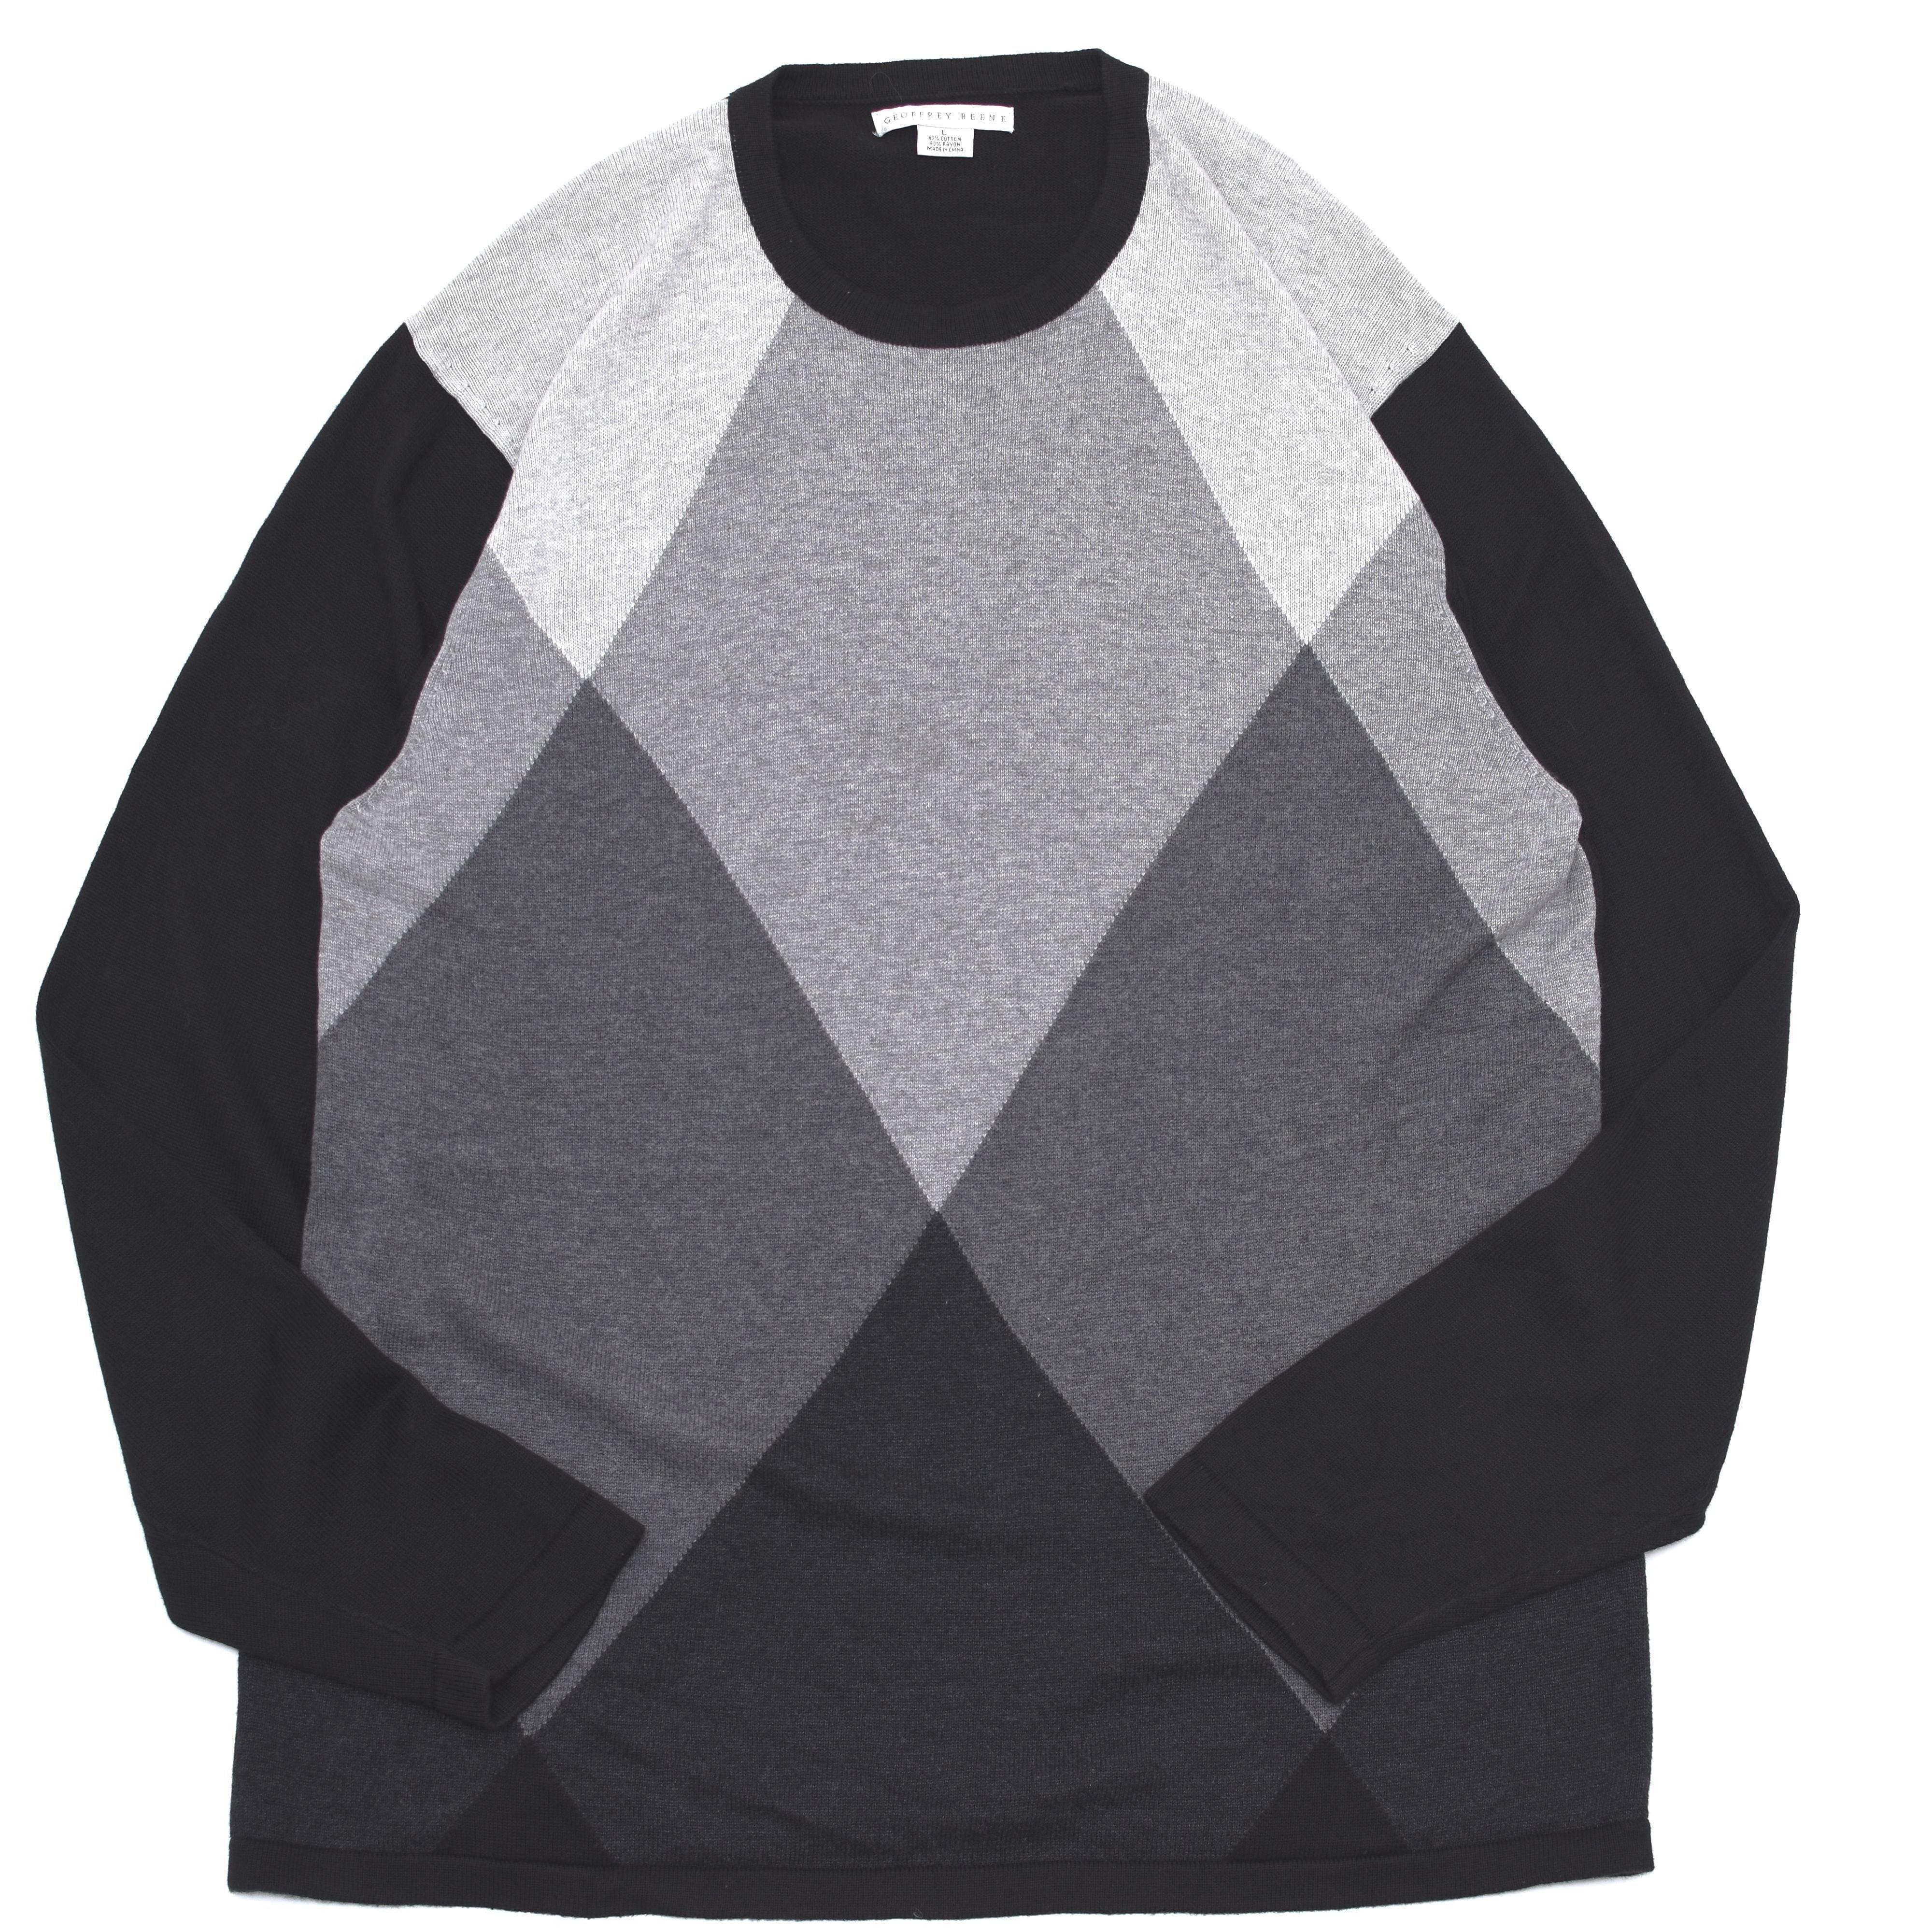 Diamond pattern cotton×rayon design Knit